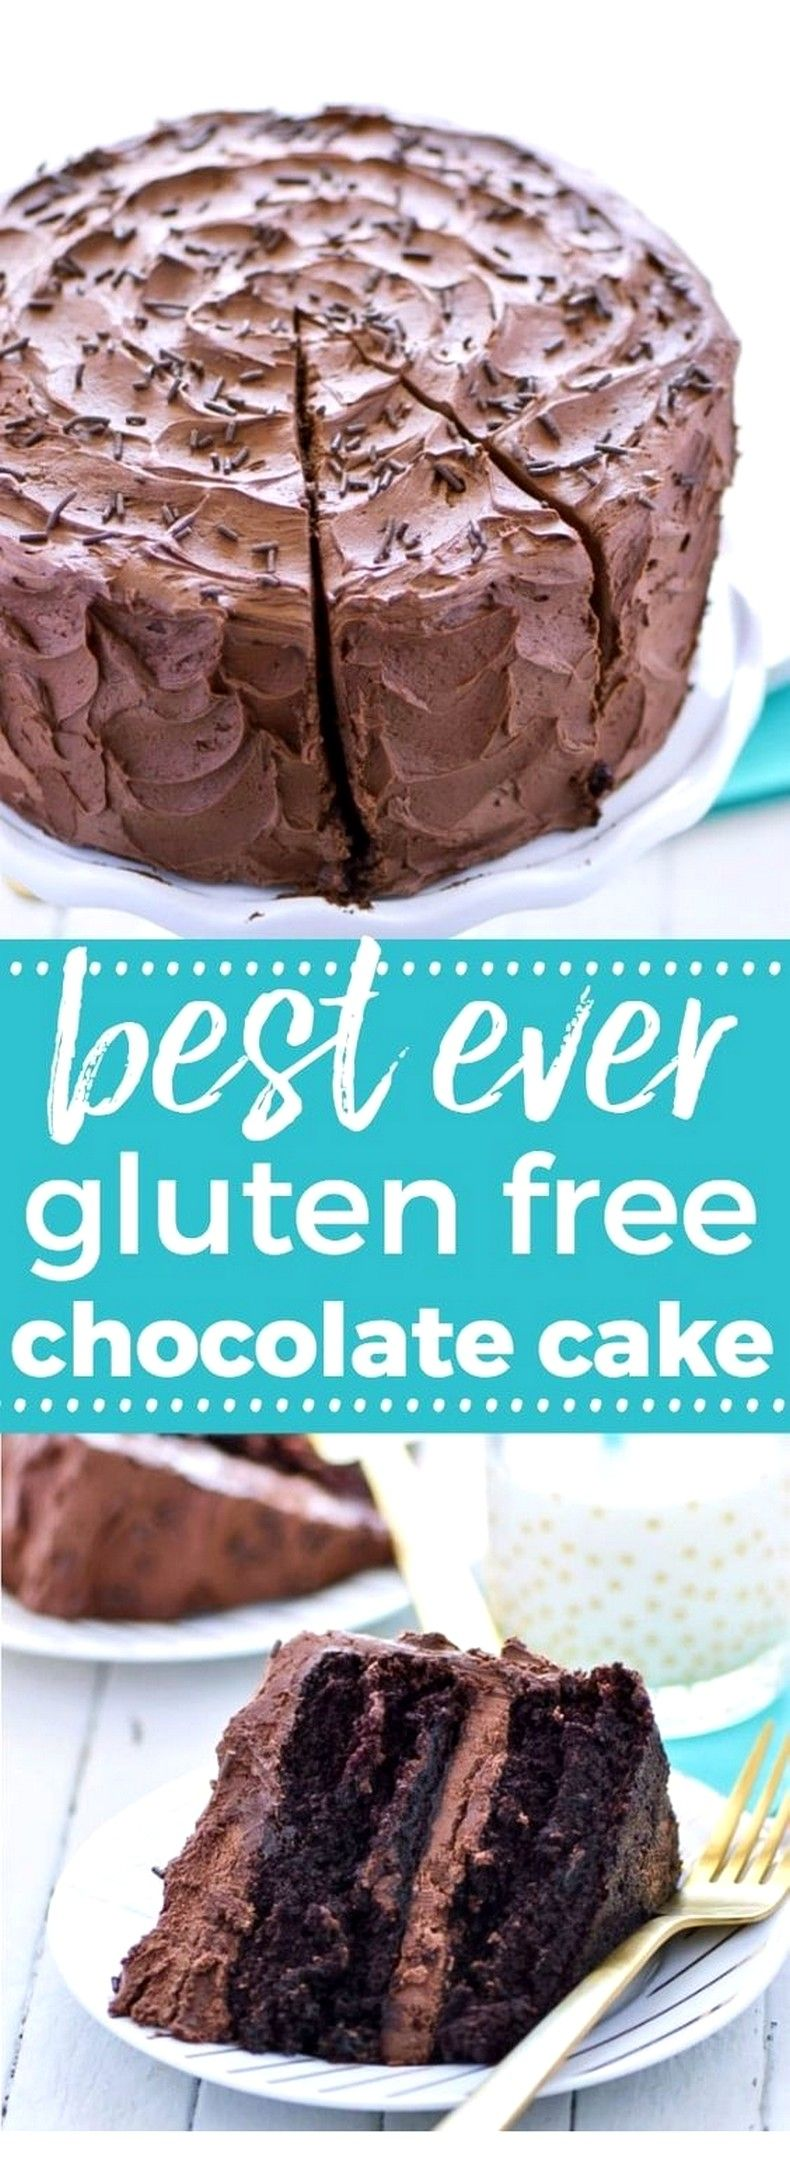 Best ever gluten free chocolate cake recipe gluten